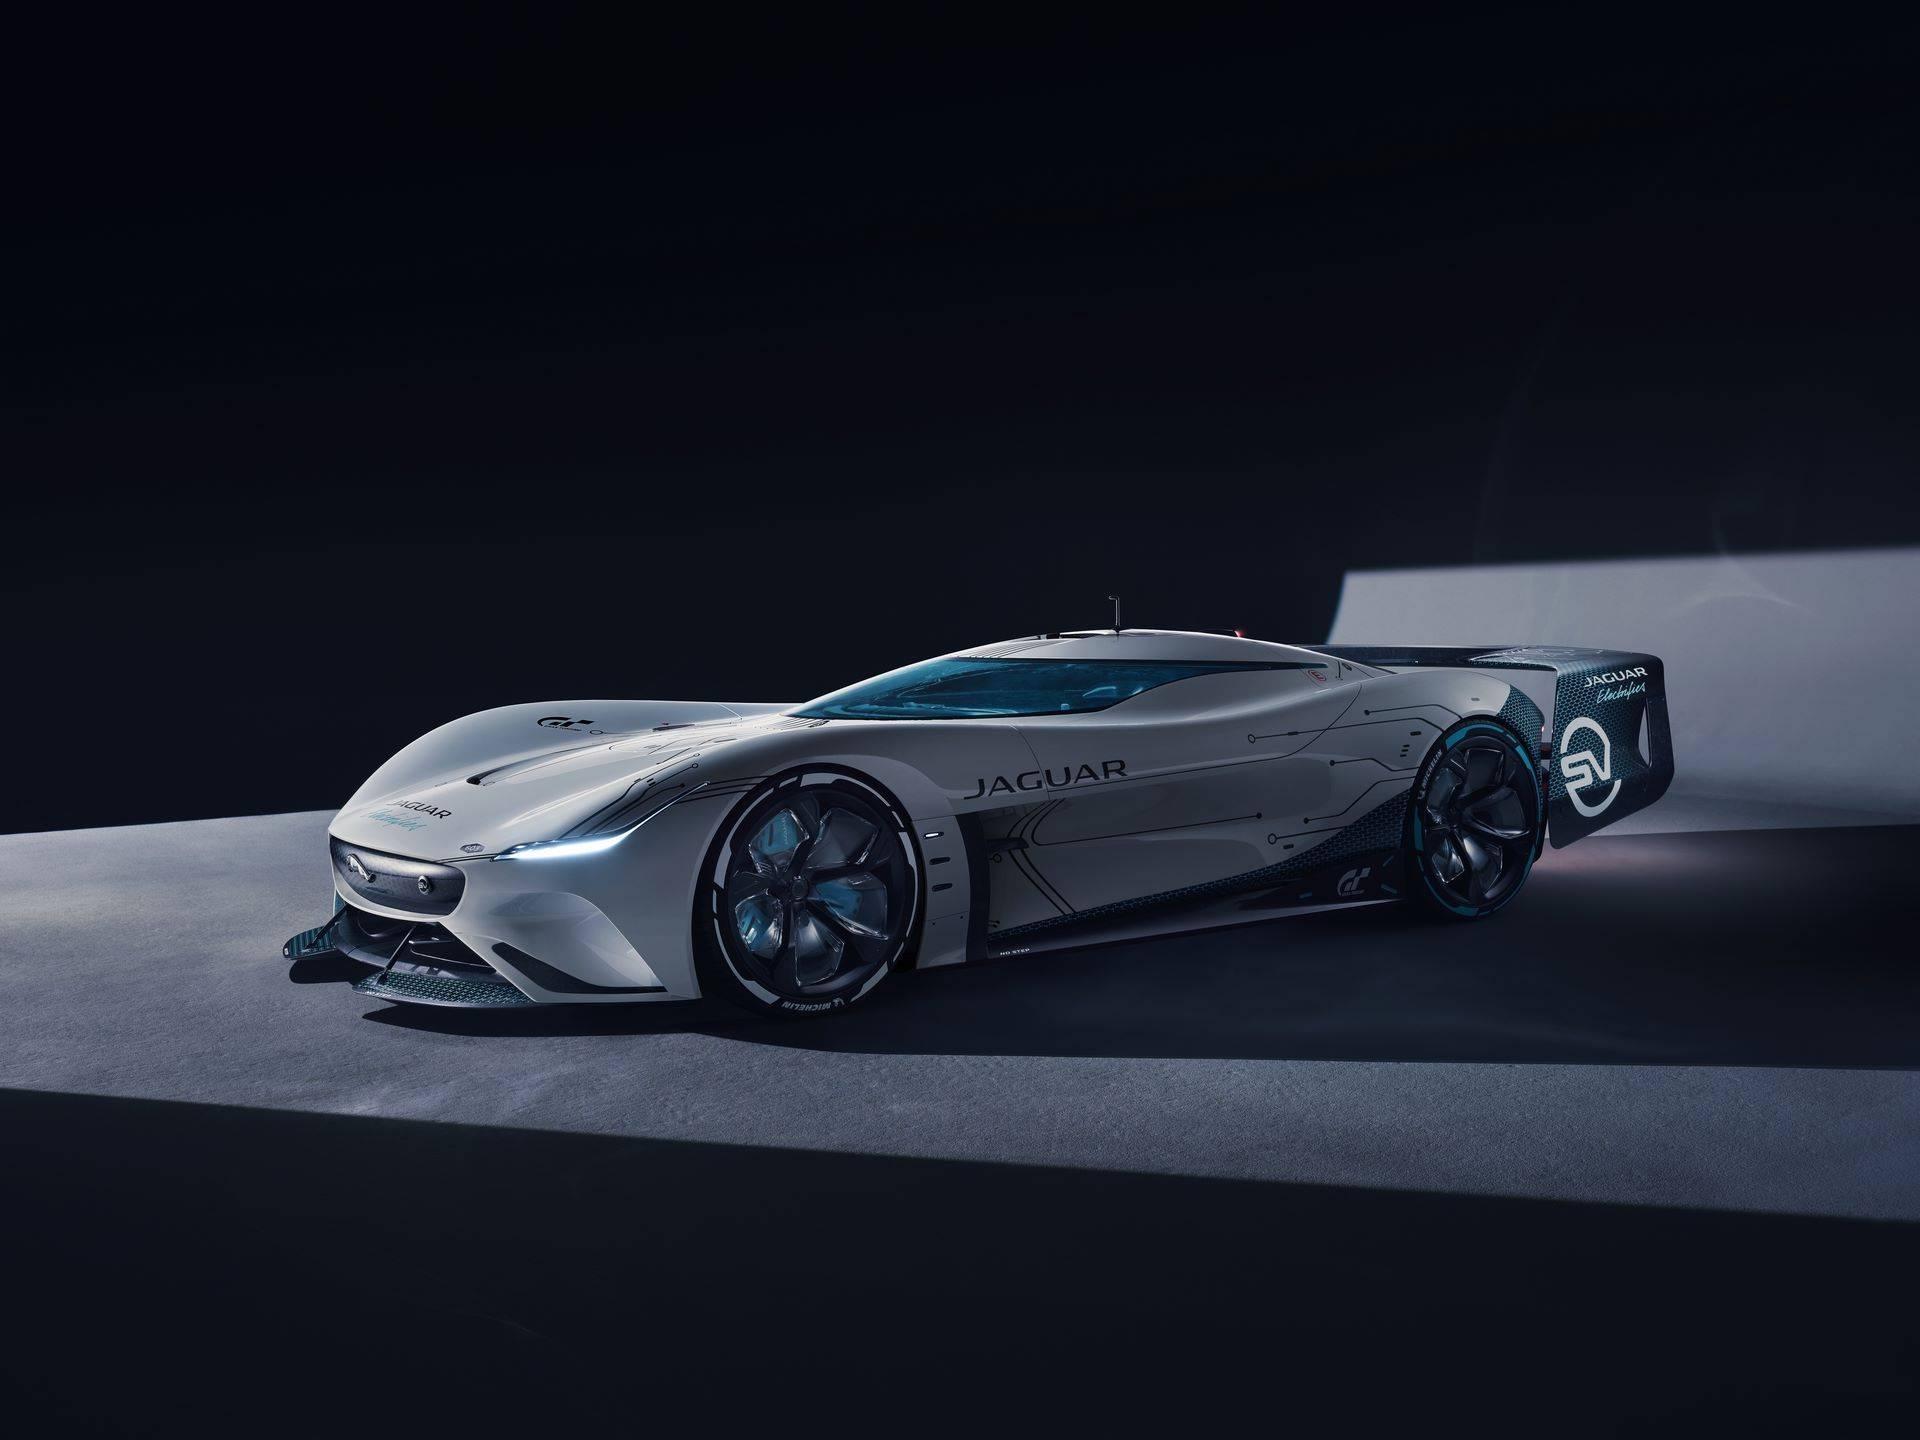 Jaguar-Vision-Gran-Turismo-SV-29